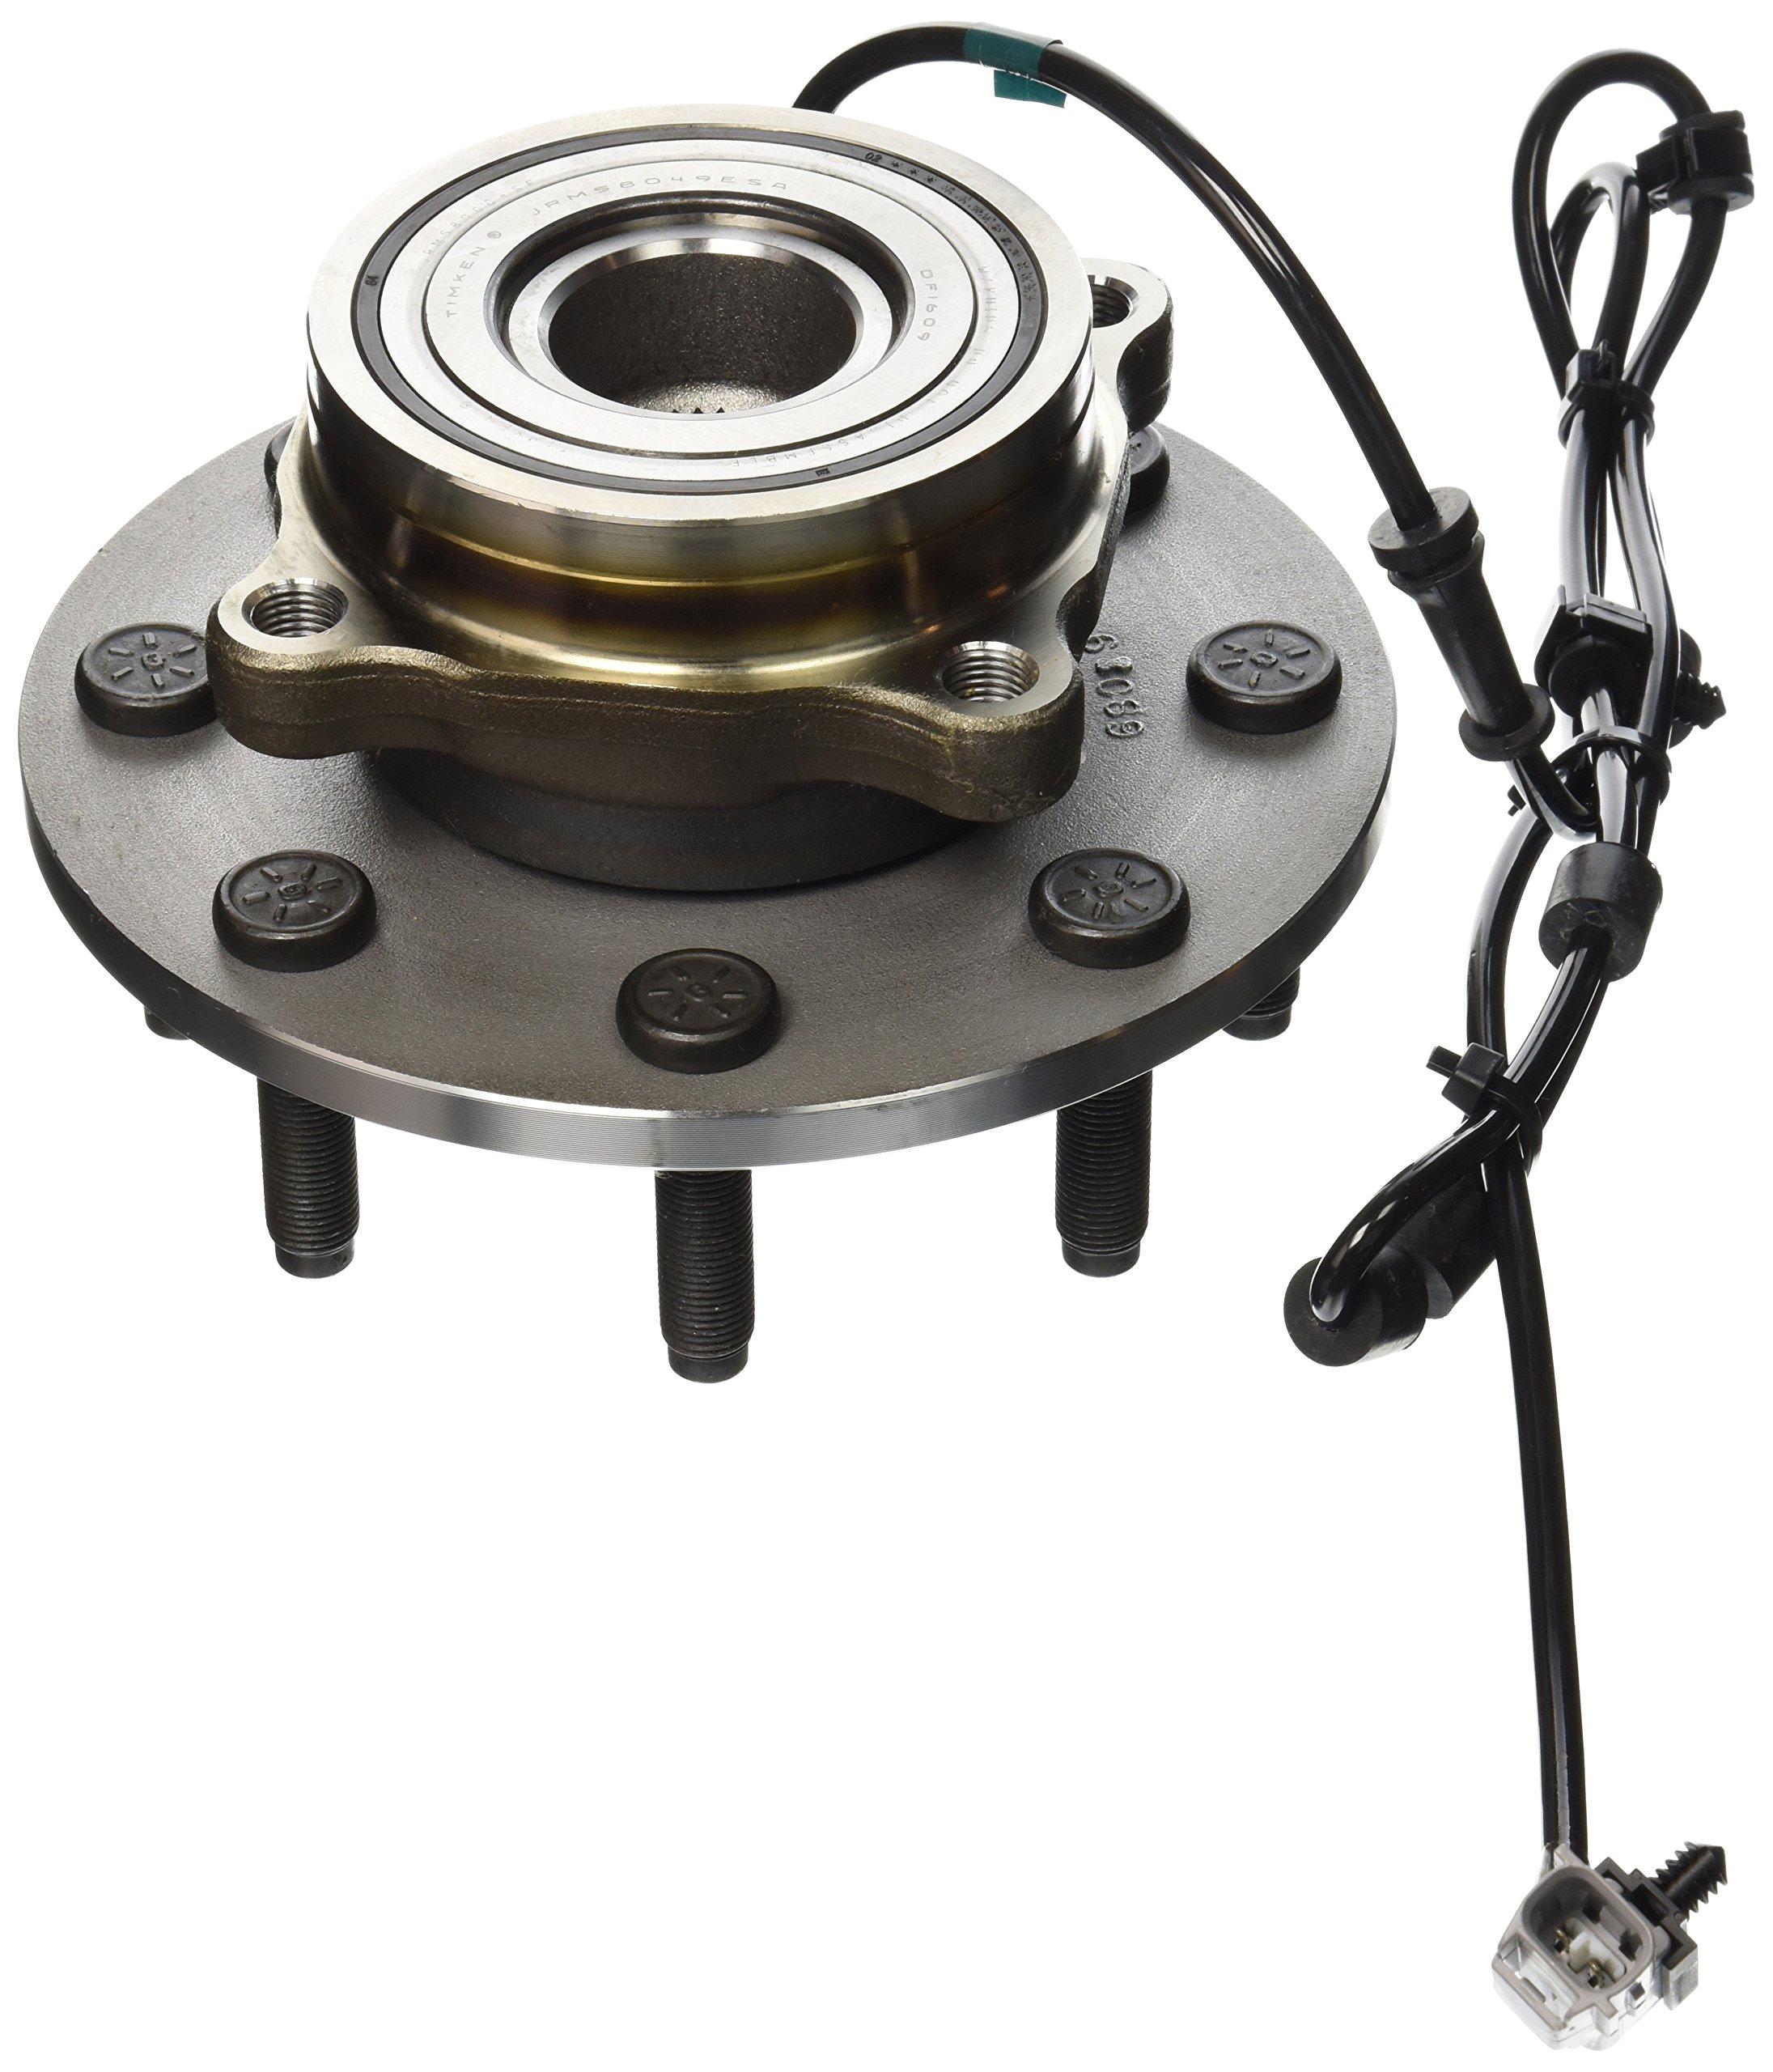 Timken HA590203 Axle Bearing and Hub Assembly